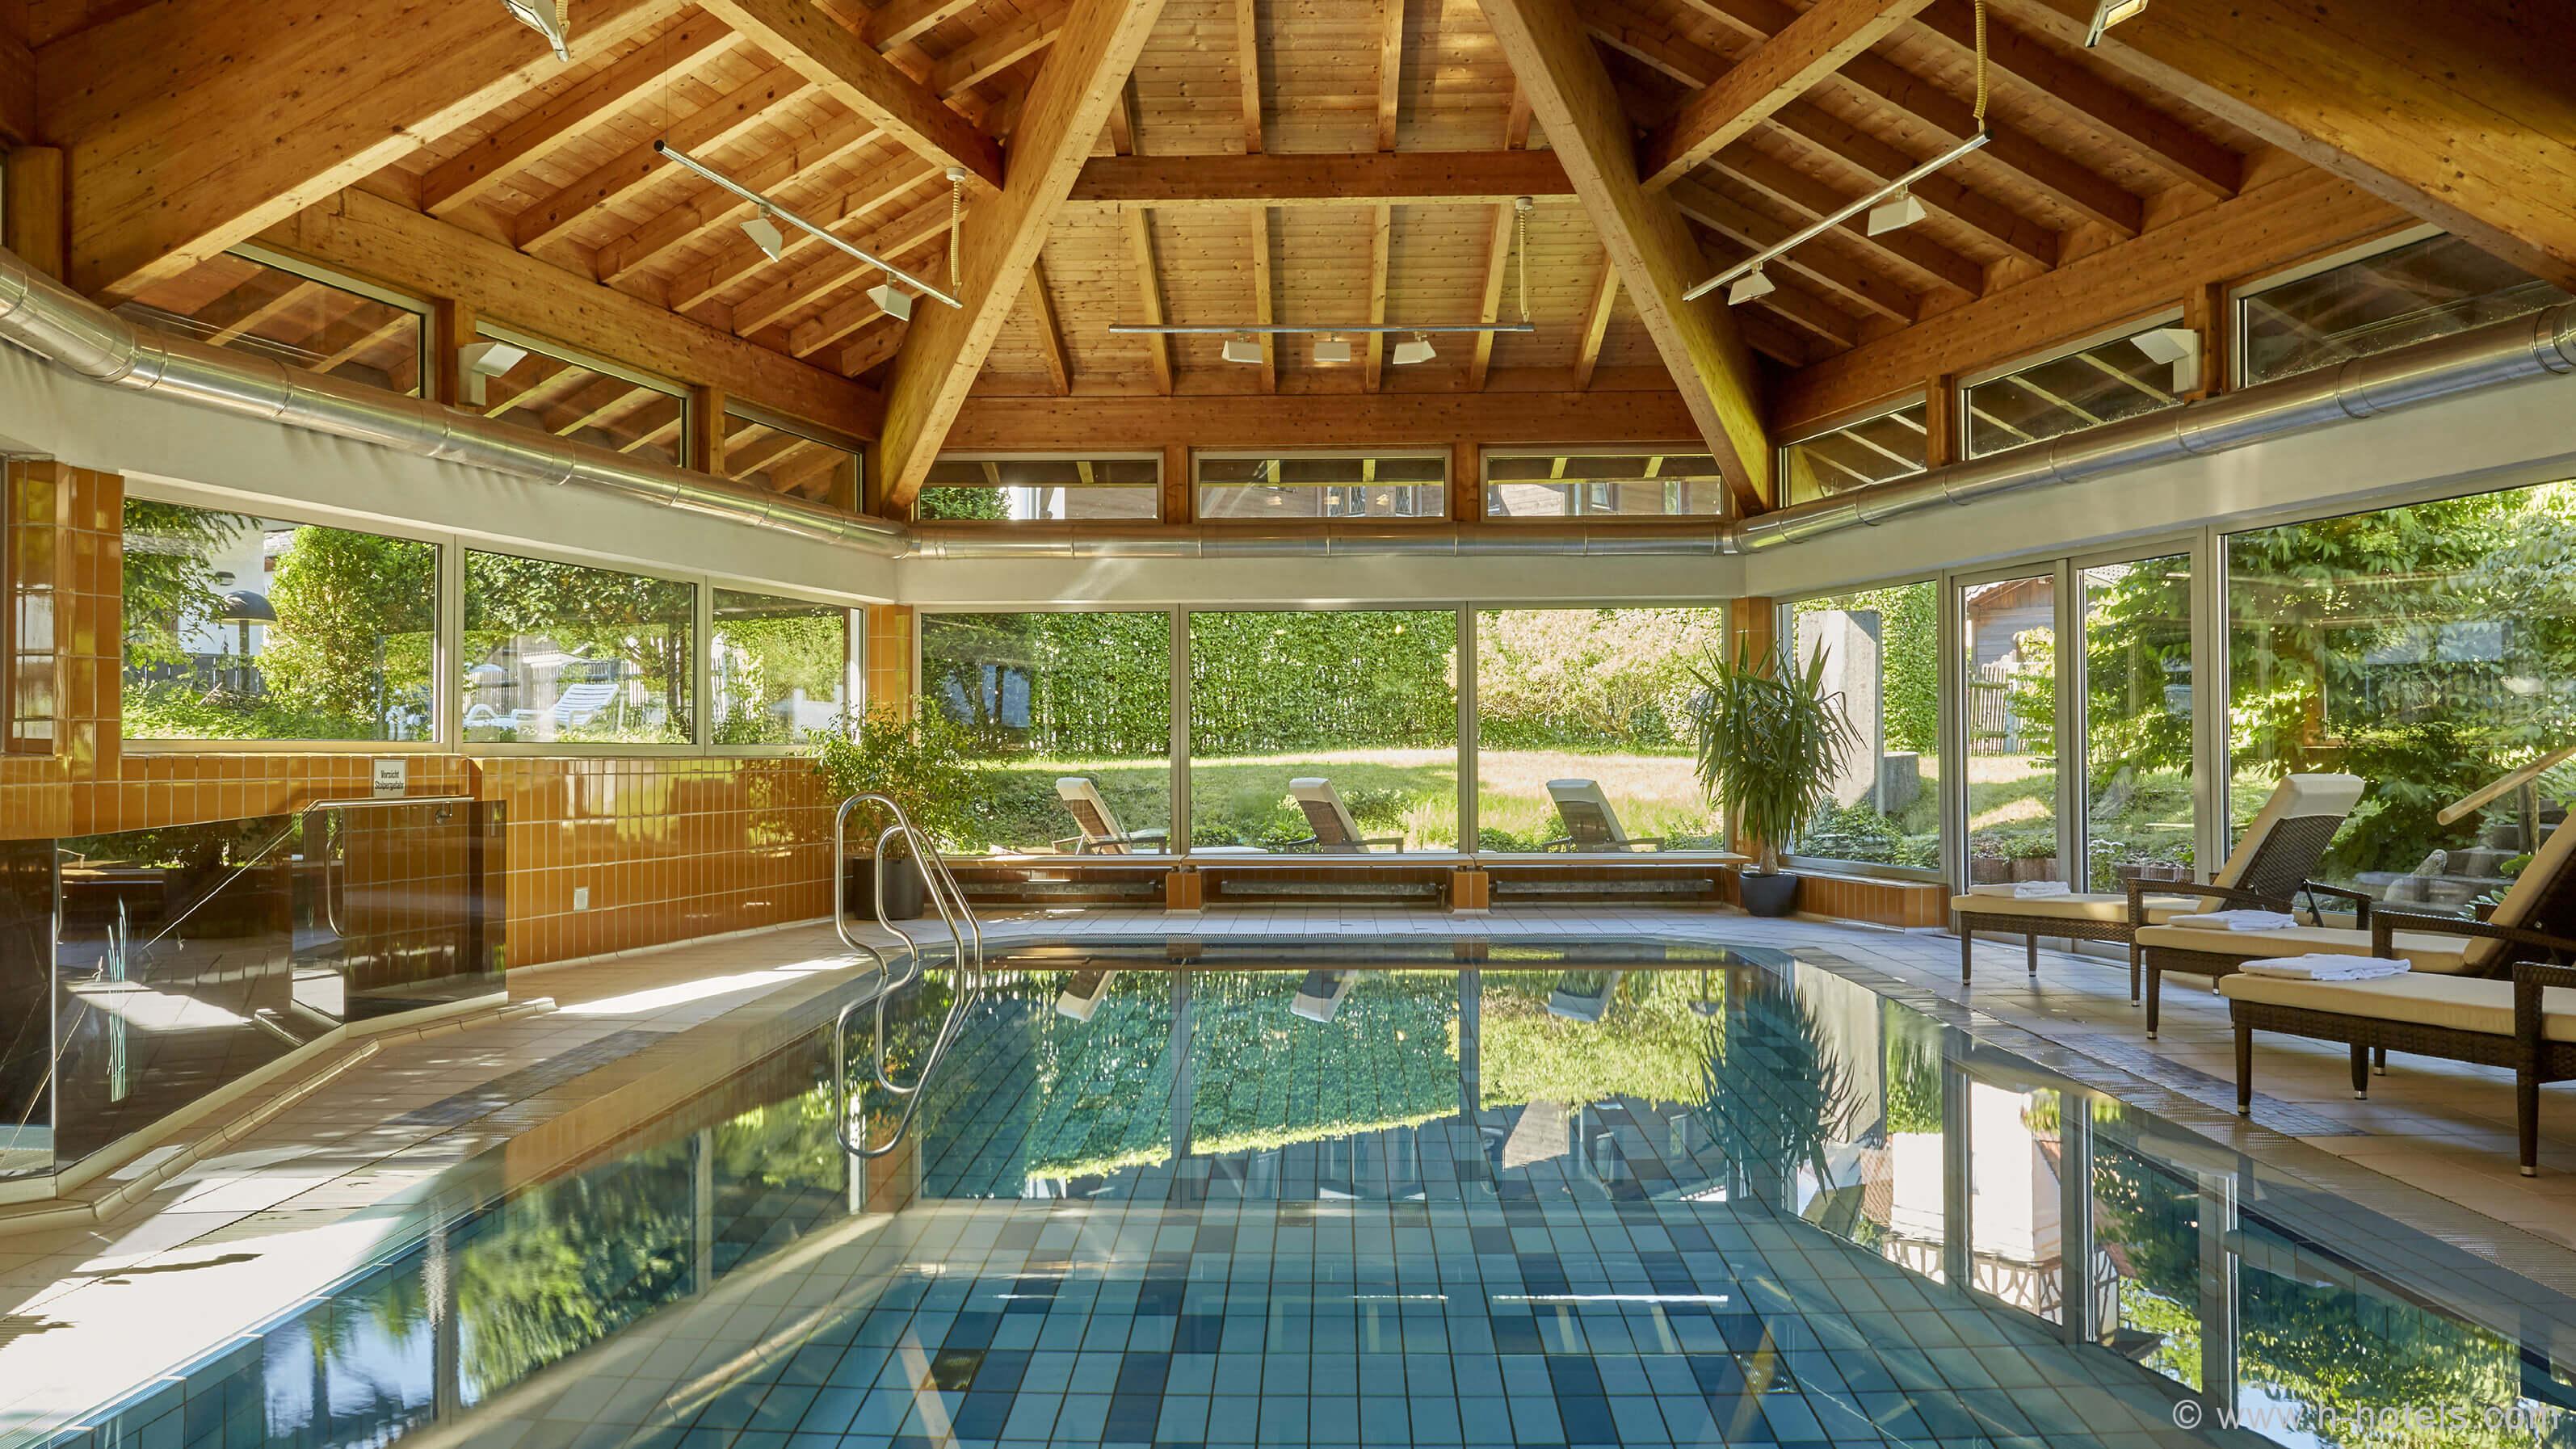 h-hotels_wellness-schwimmbad-01-hplus-hotel-garmisch_Original-(kommerz.-Nutzung)-_a856d0b9_